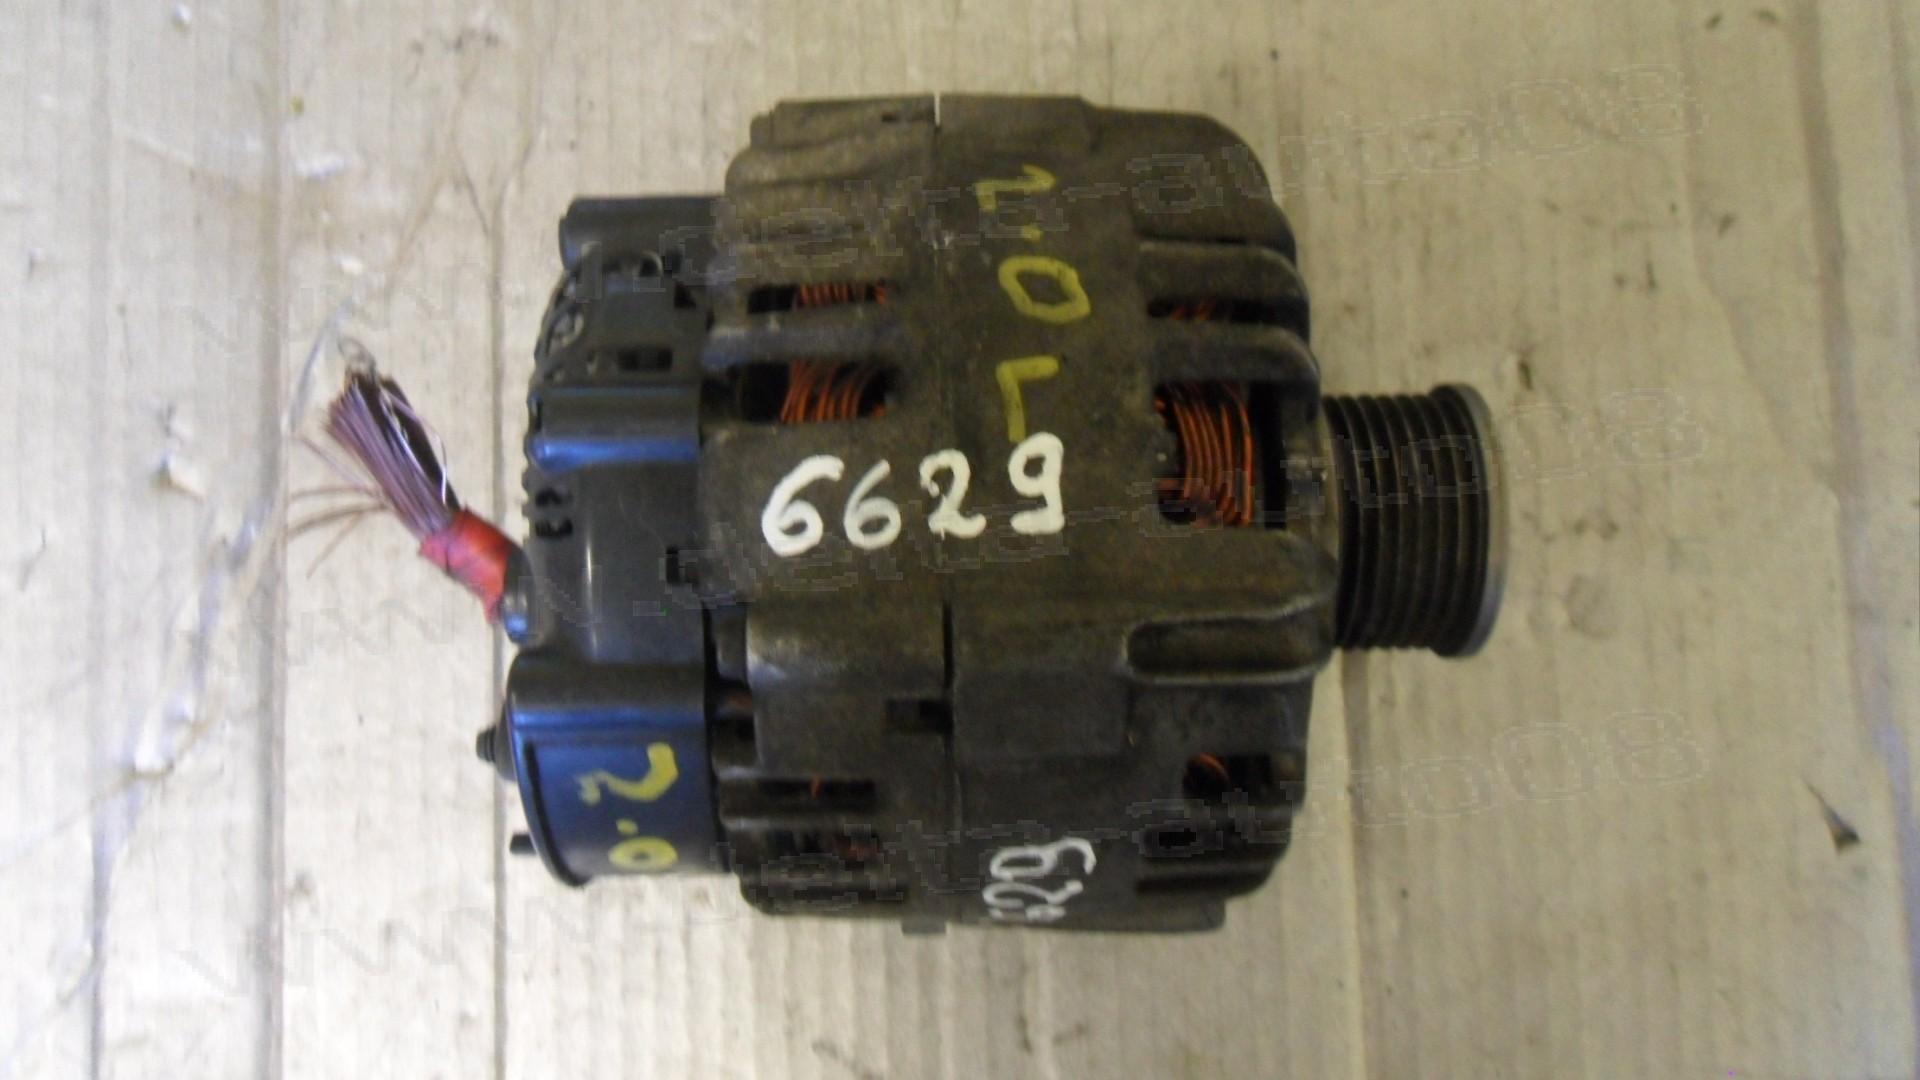 Алтернатор, генератор за Renault Trafic, 2.0 D, 2001-2011г., 150A, 14V, 401 74 0042, 401740042, LRA03036